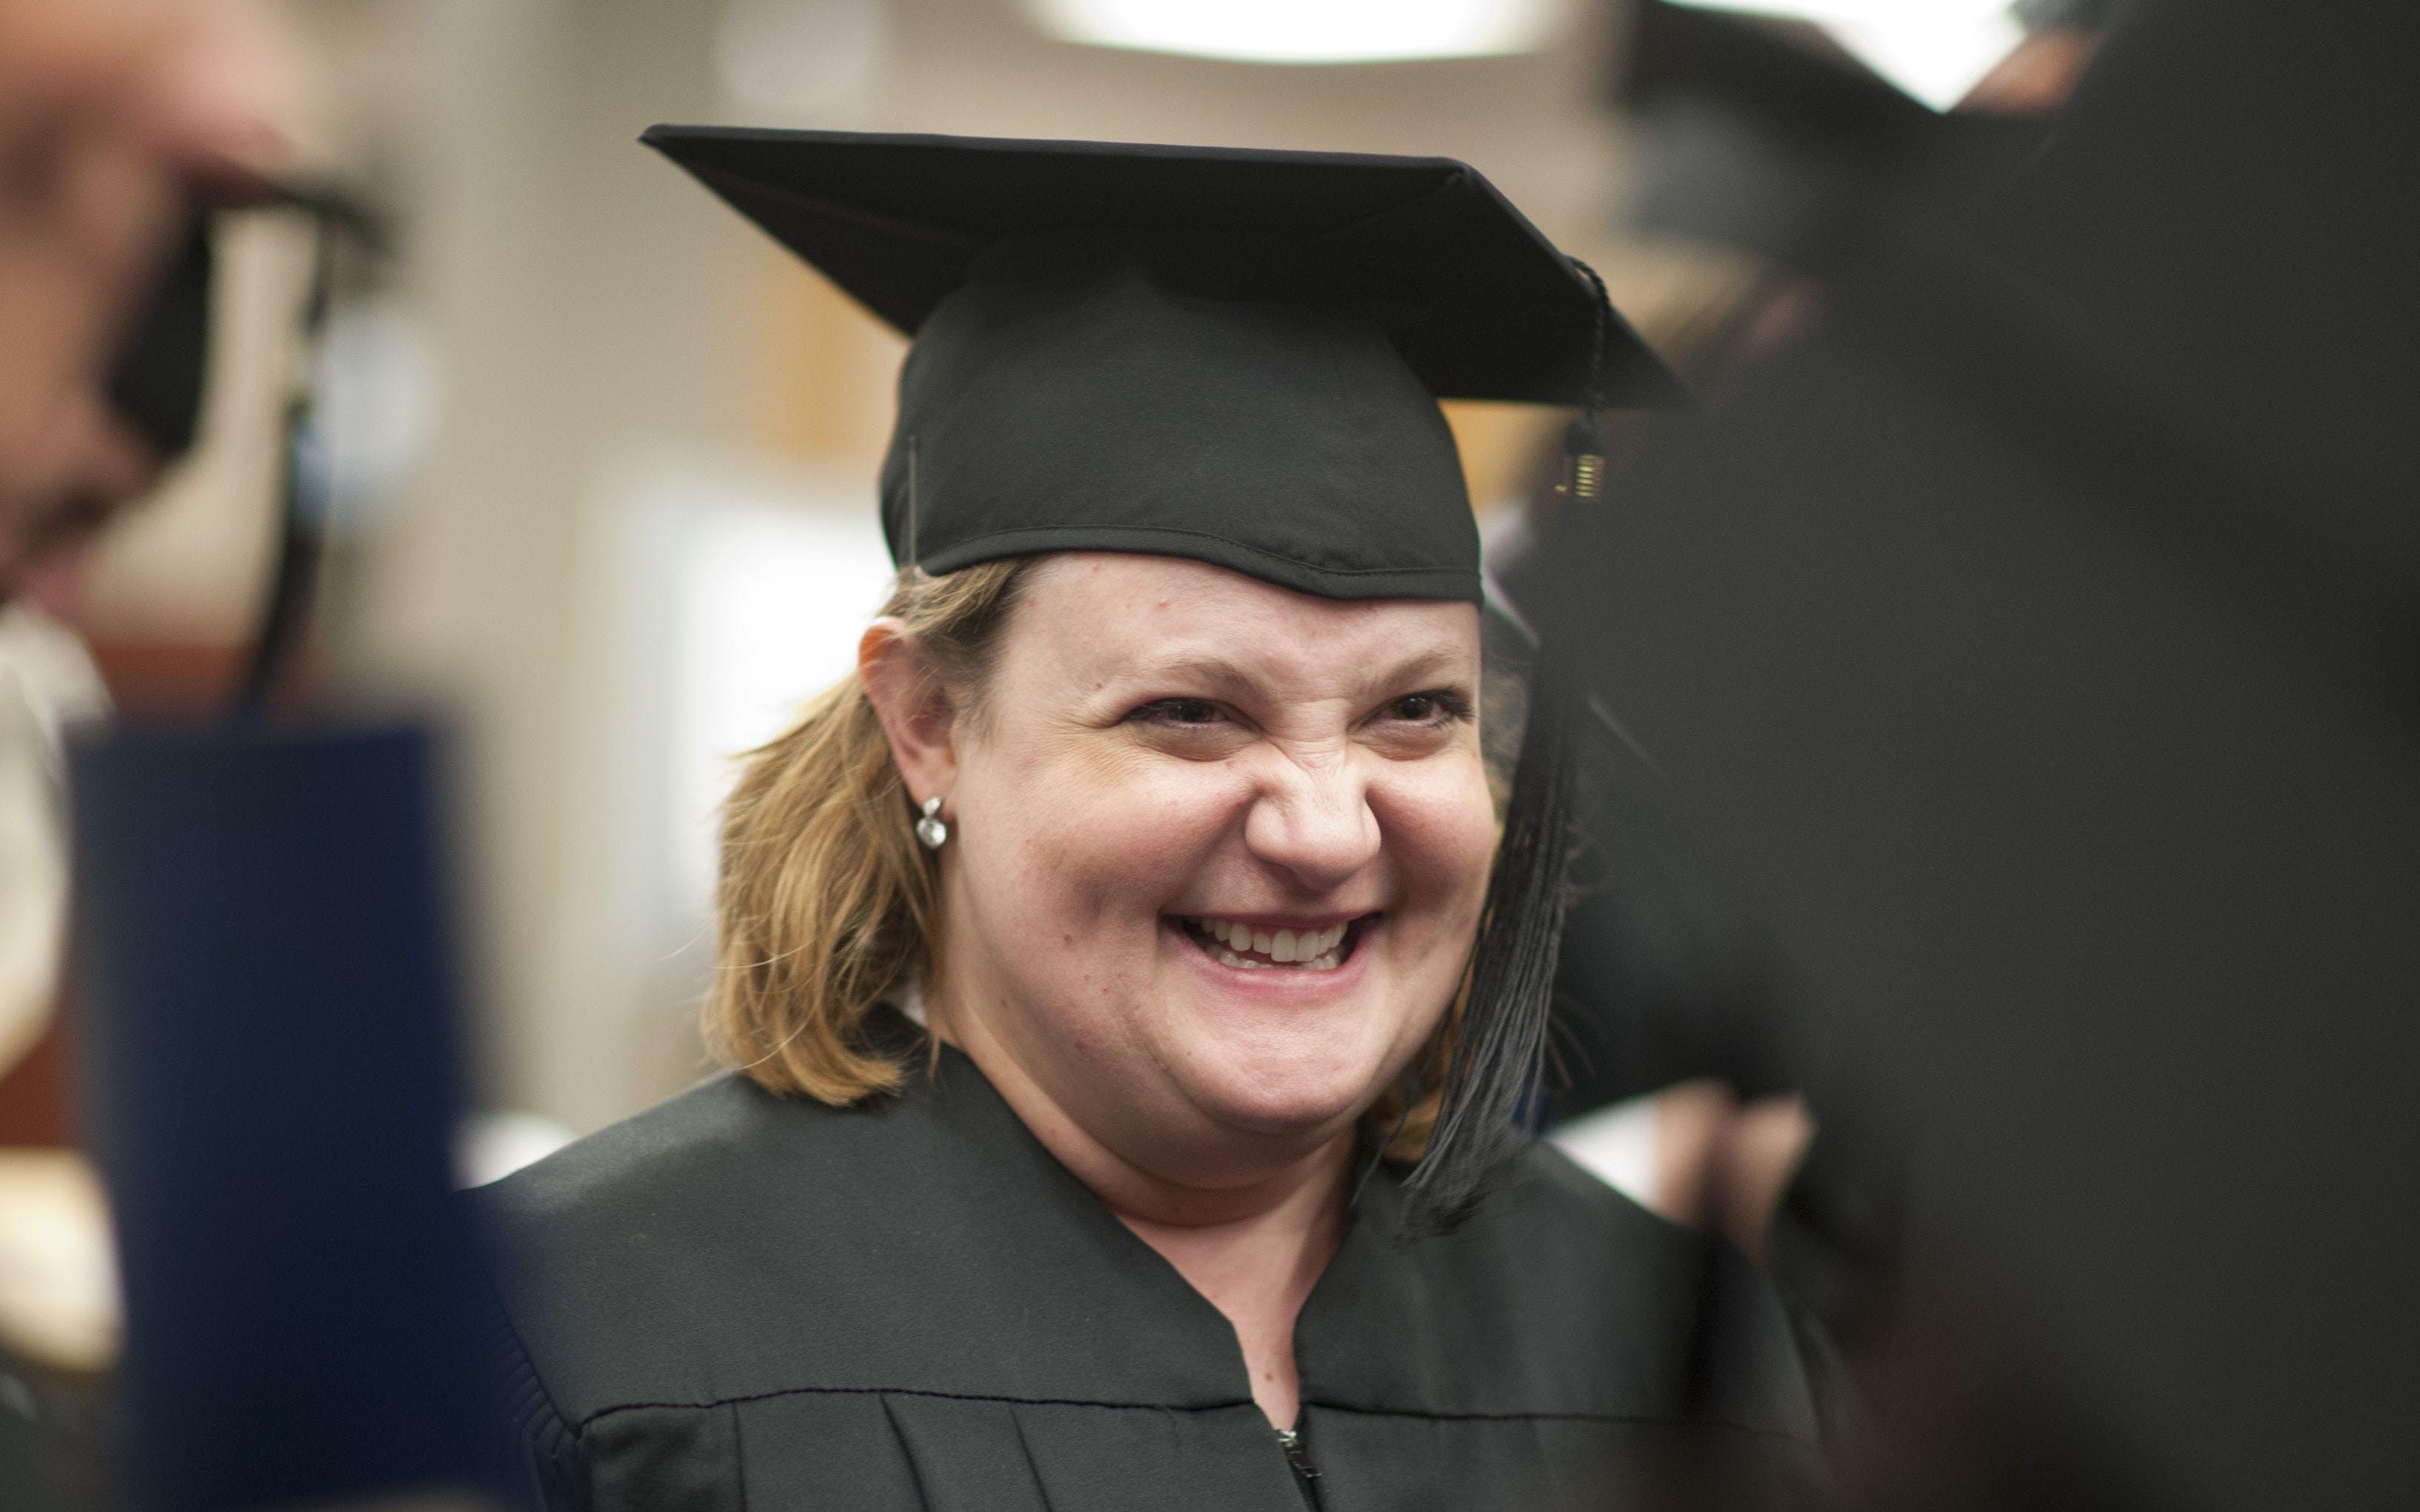 An adult graduates